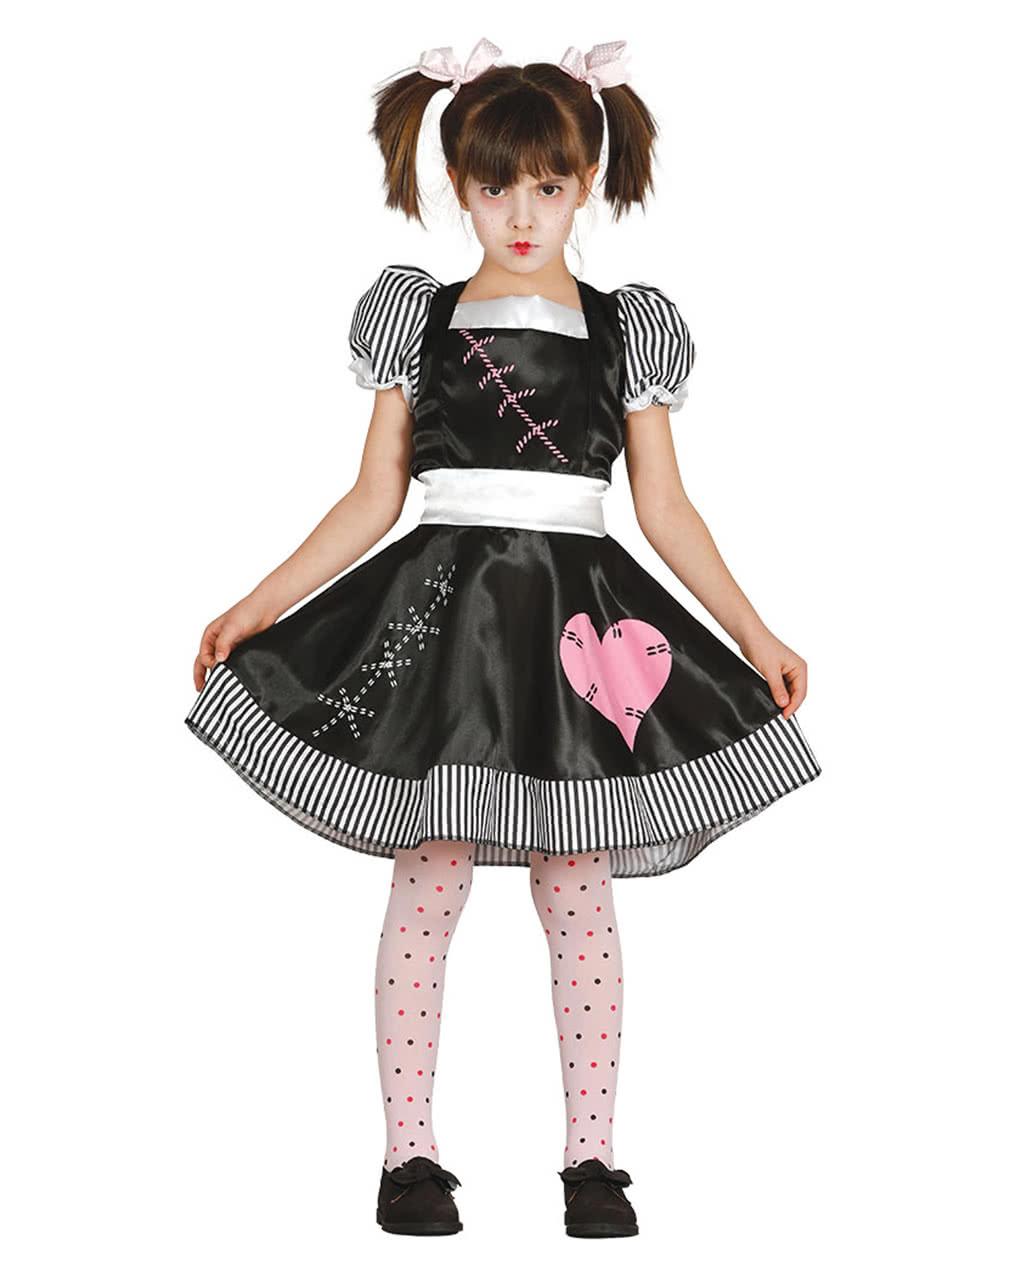 Horror doll costume | Ragdoll for Halloween Kids Party | horror-shop.com